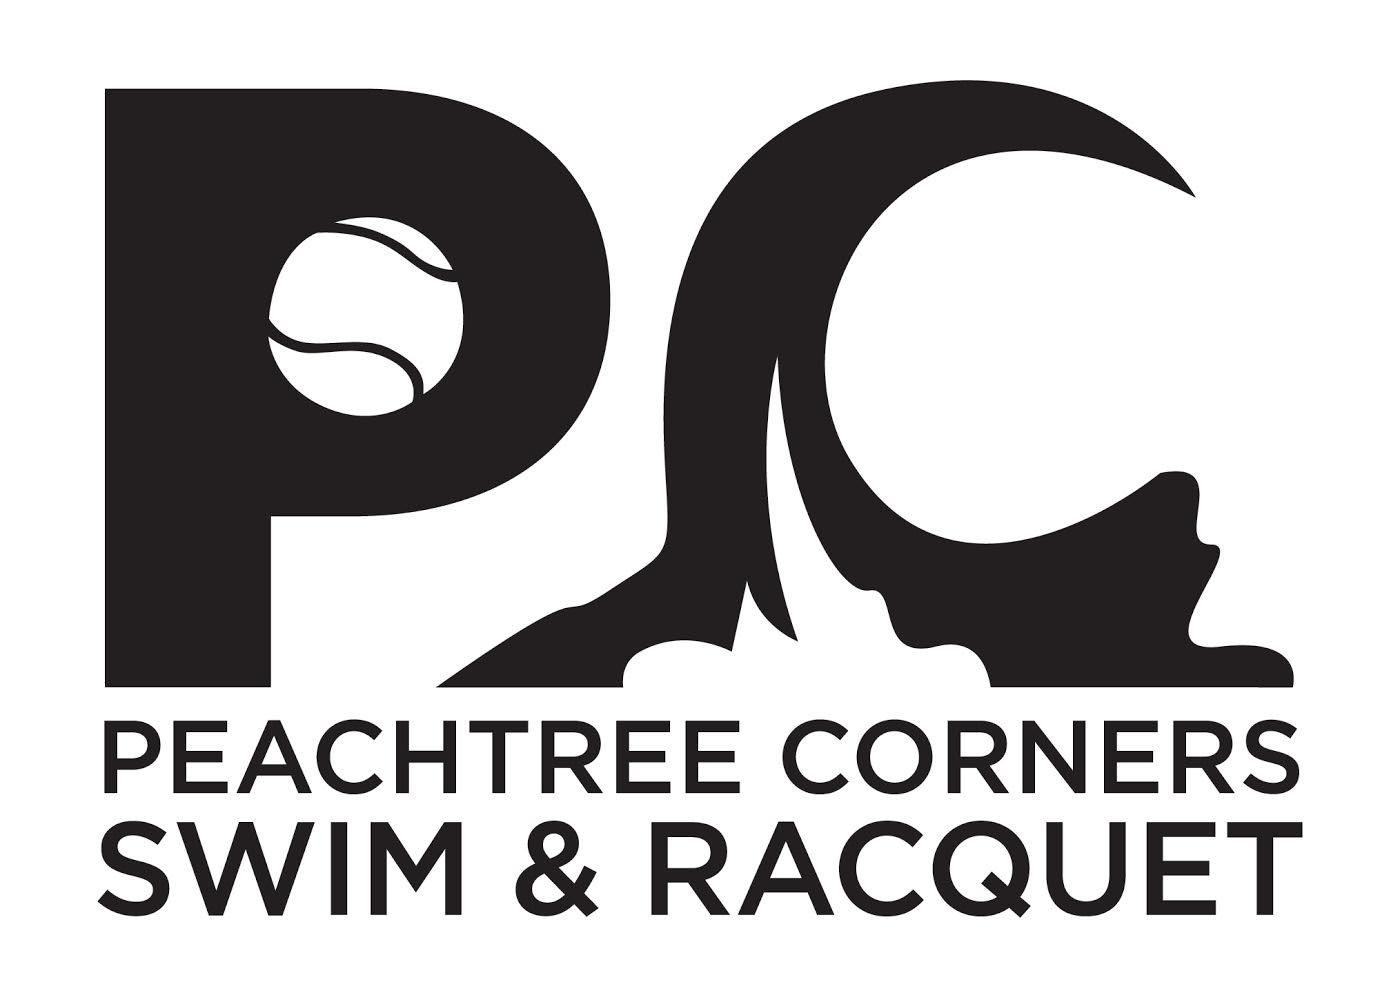 peachtree-corners-swim-and-racquet